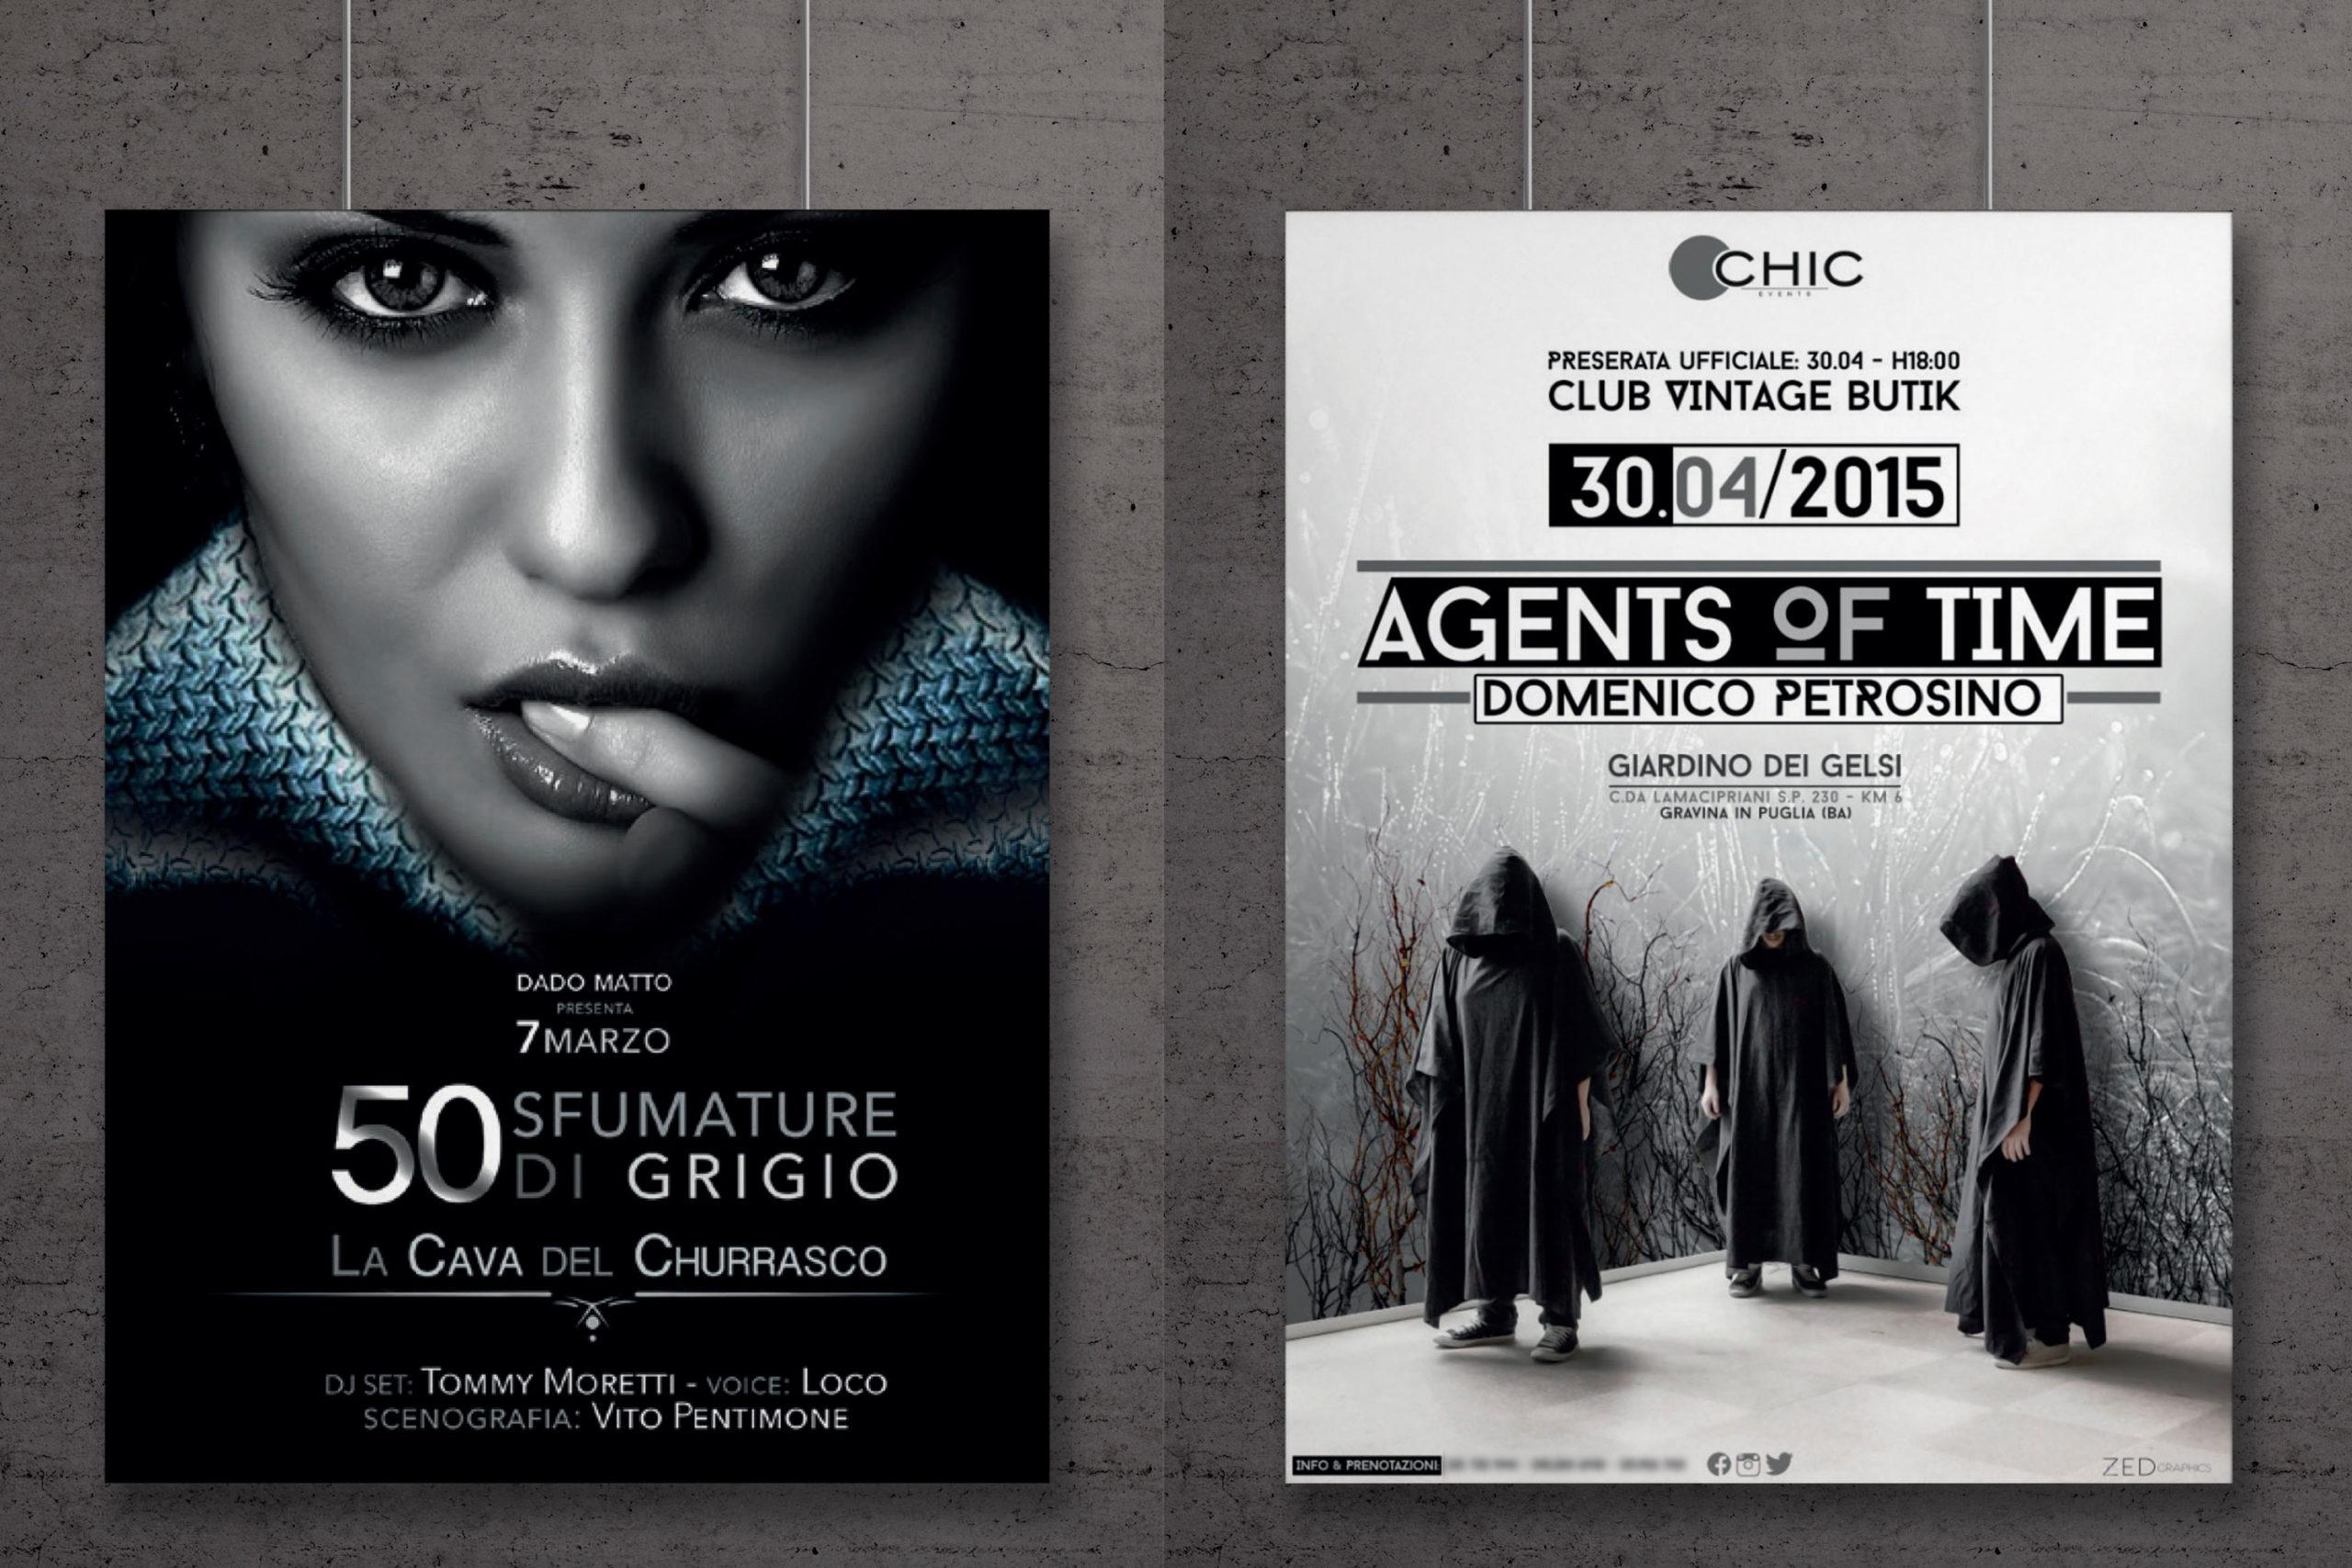 CHIC Events & Project X – Puglia, IT / 2014-2016